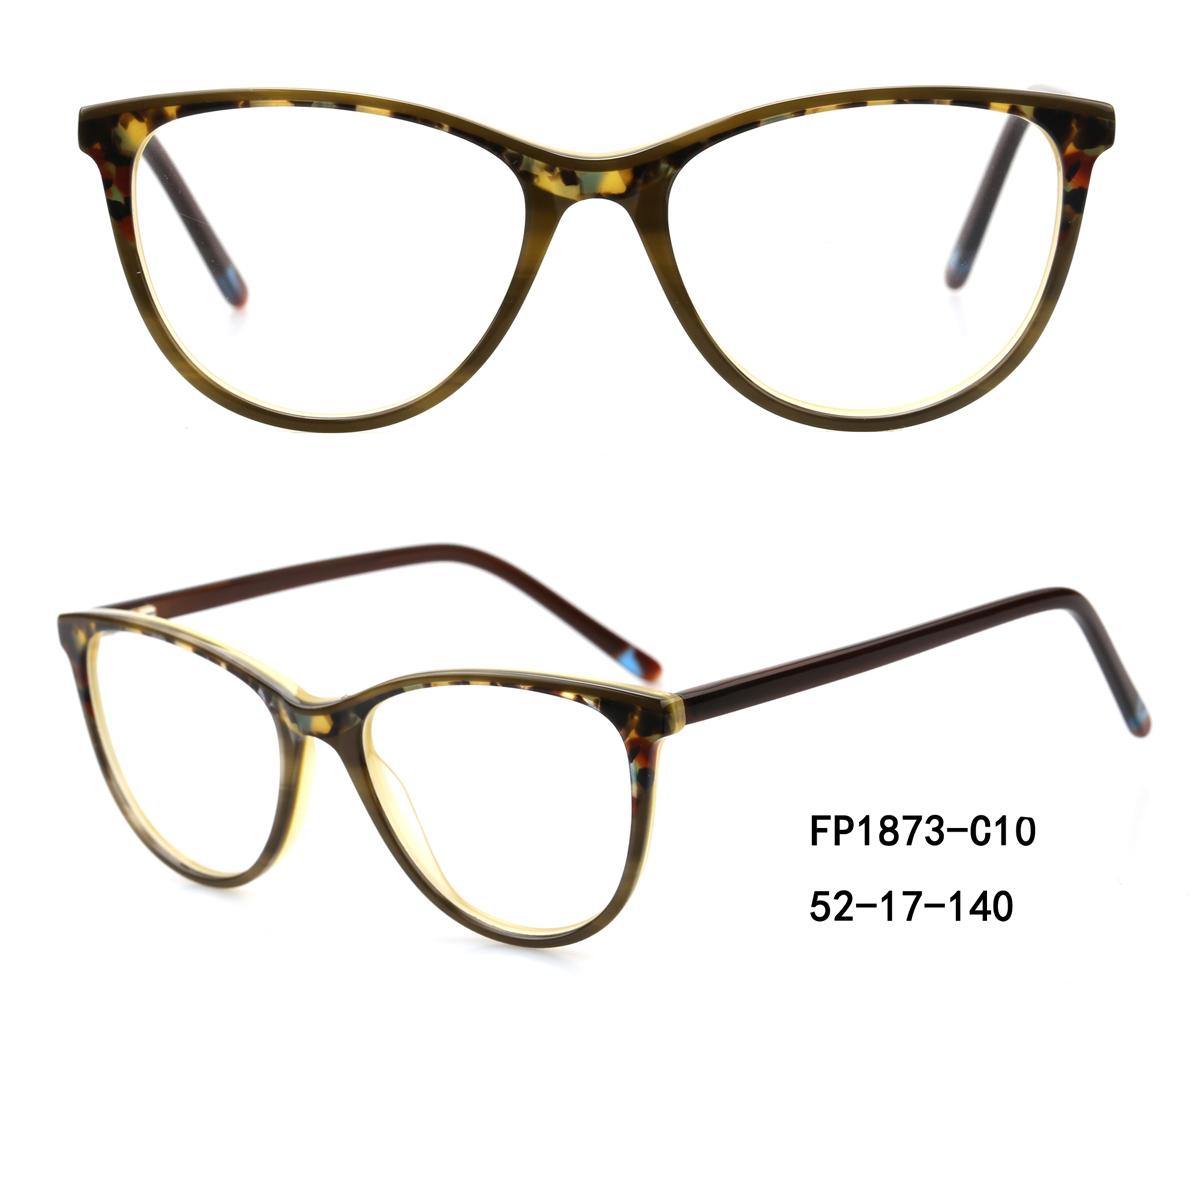 Wooden Prescription Glasses Frame Wholesale,Wood Eyeglass Frame Supplier